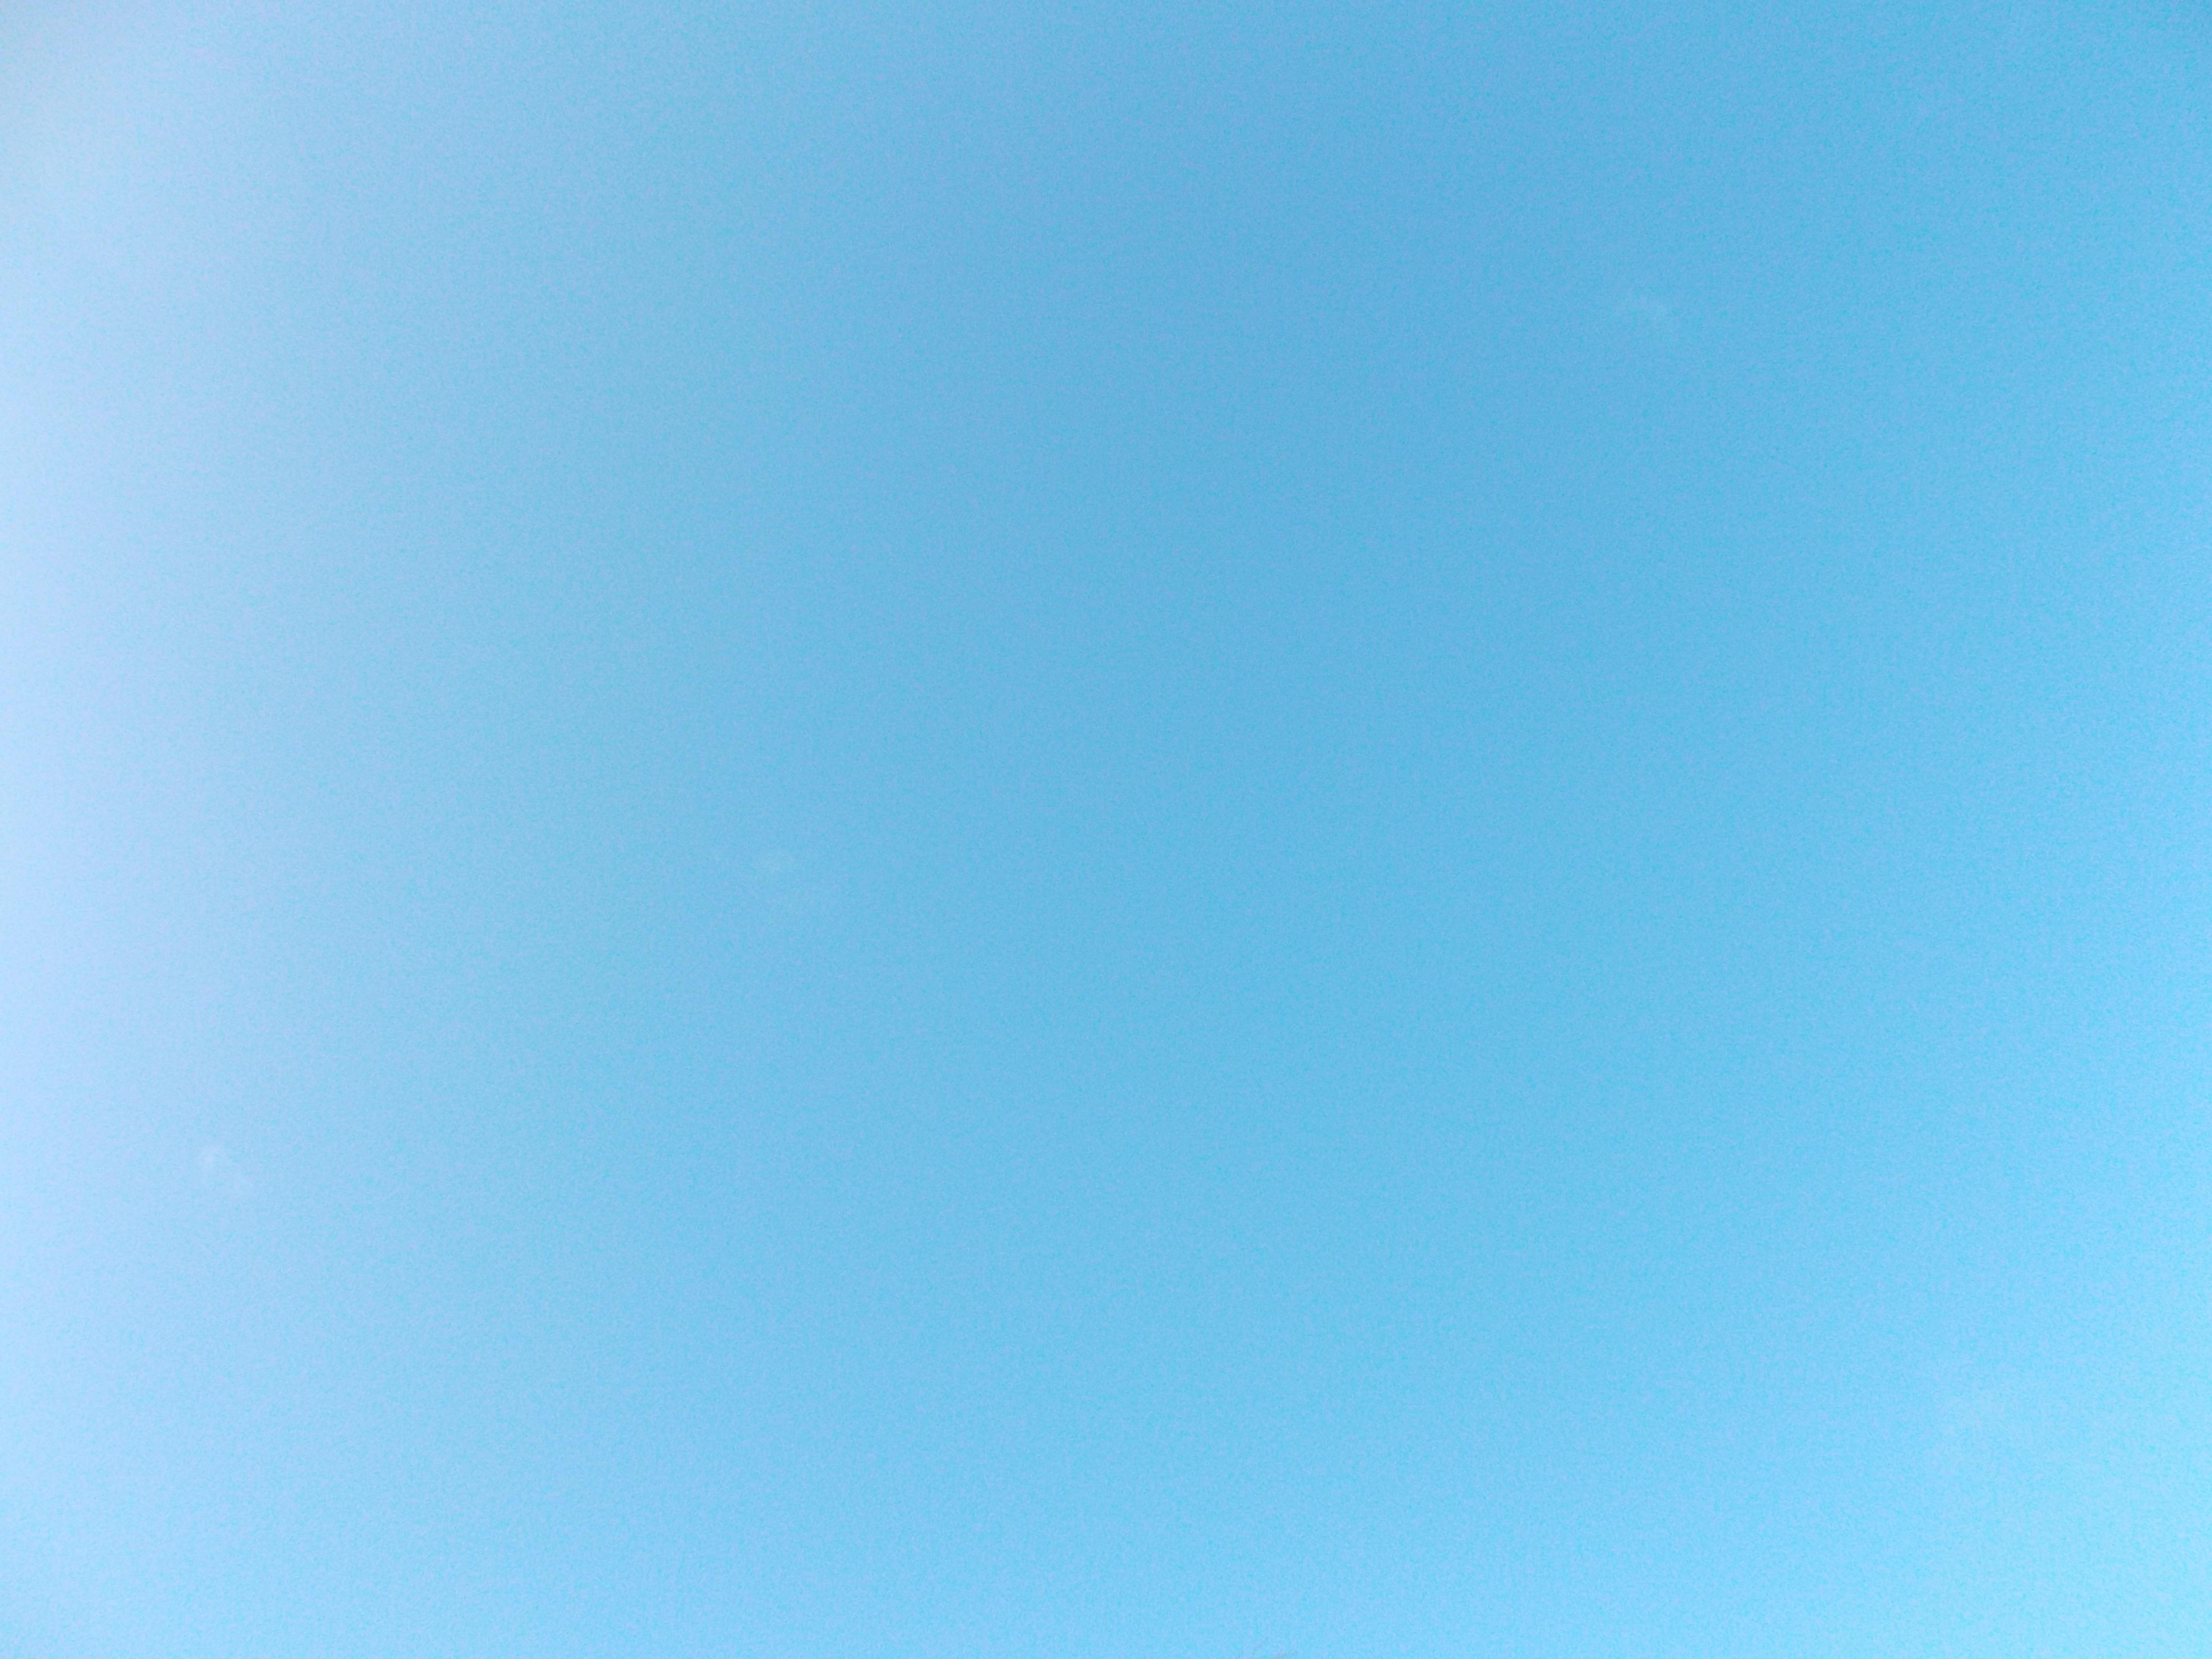 2013-02-05 Longitude -0.371 Latitude 49.182 Altitude 13 Heure 13h39